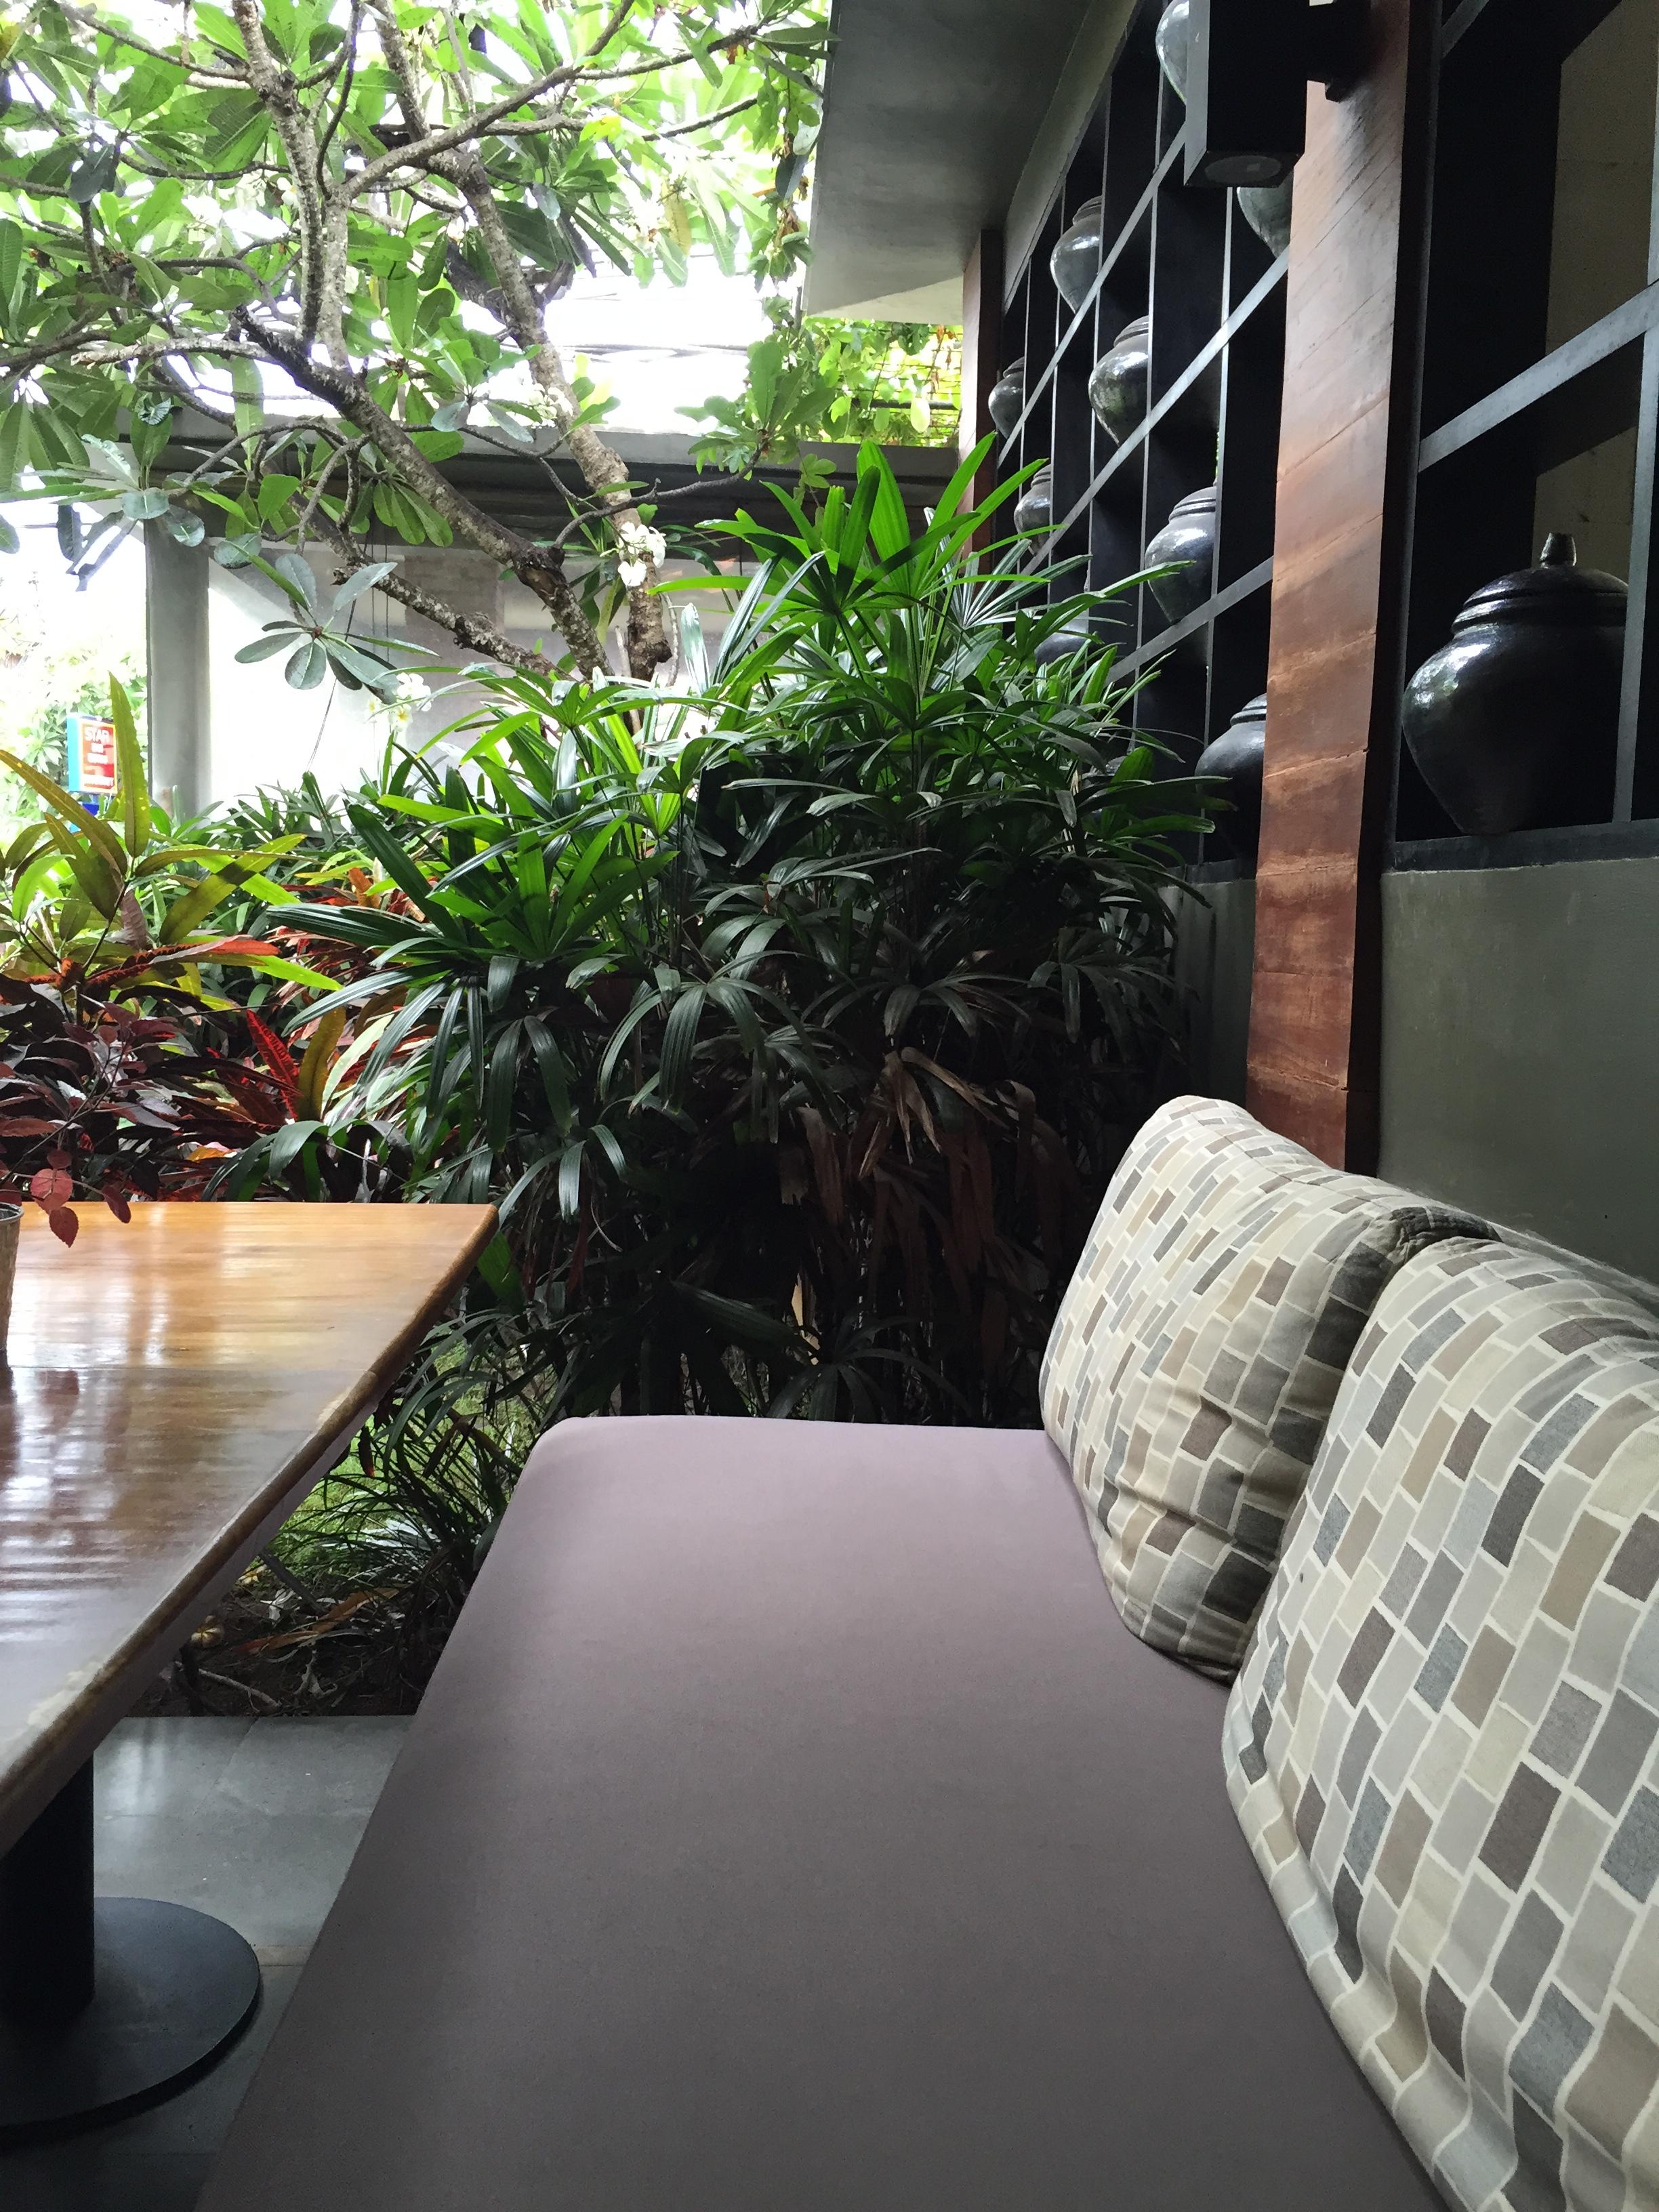 bali indoors outdoors.JPG